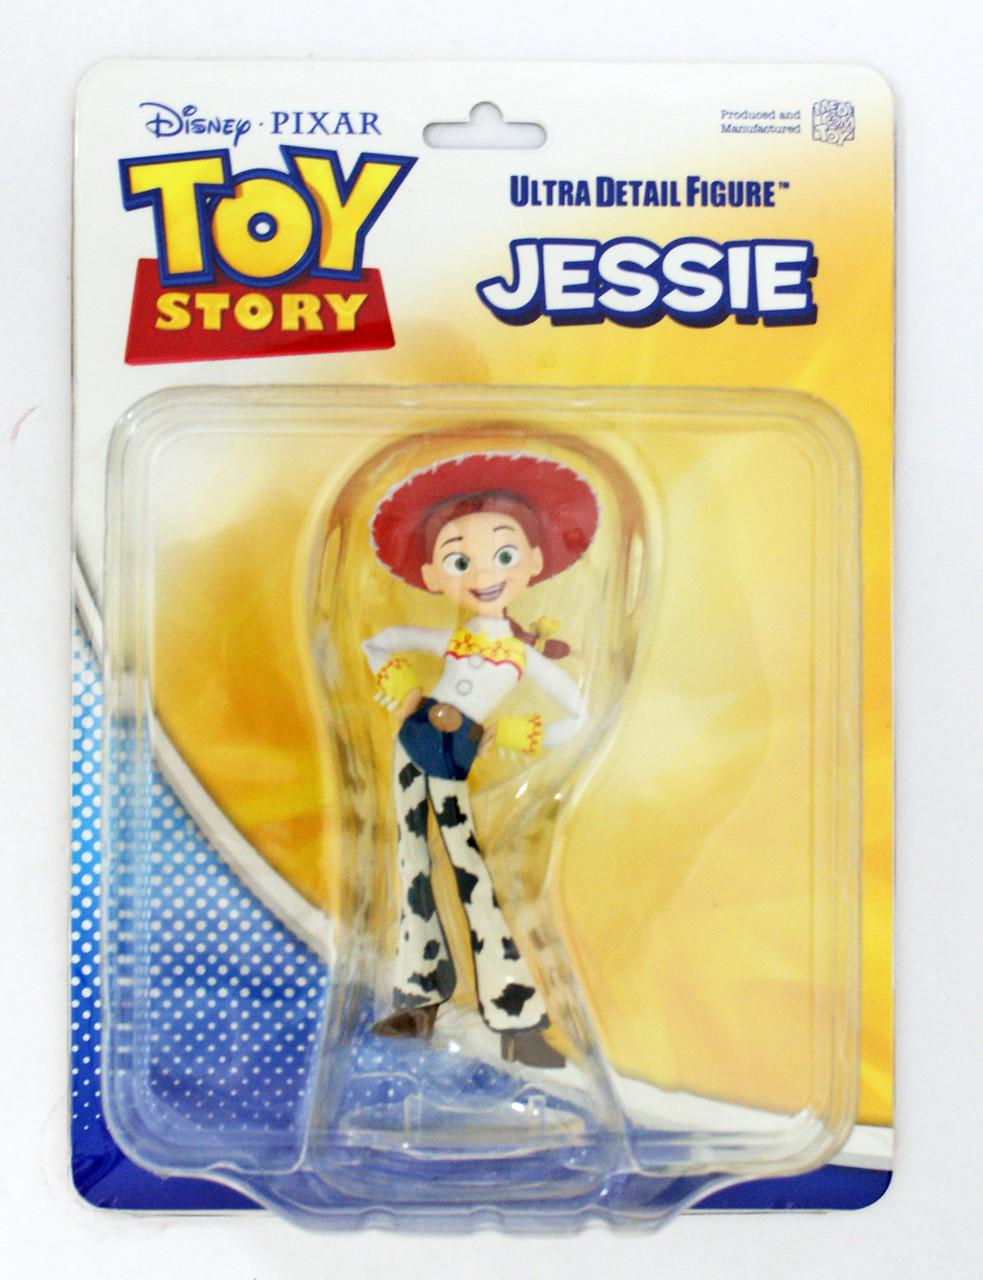 Medicom UDF Toy Story Ultra Detail Figure No.369 Hamm